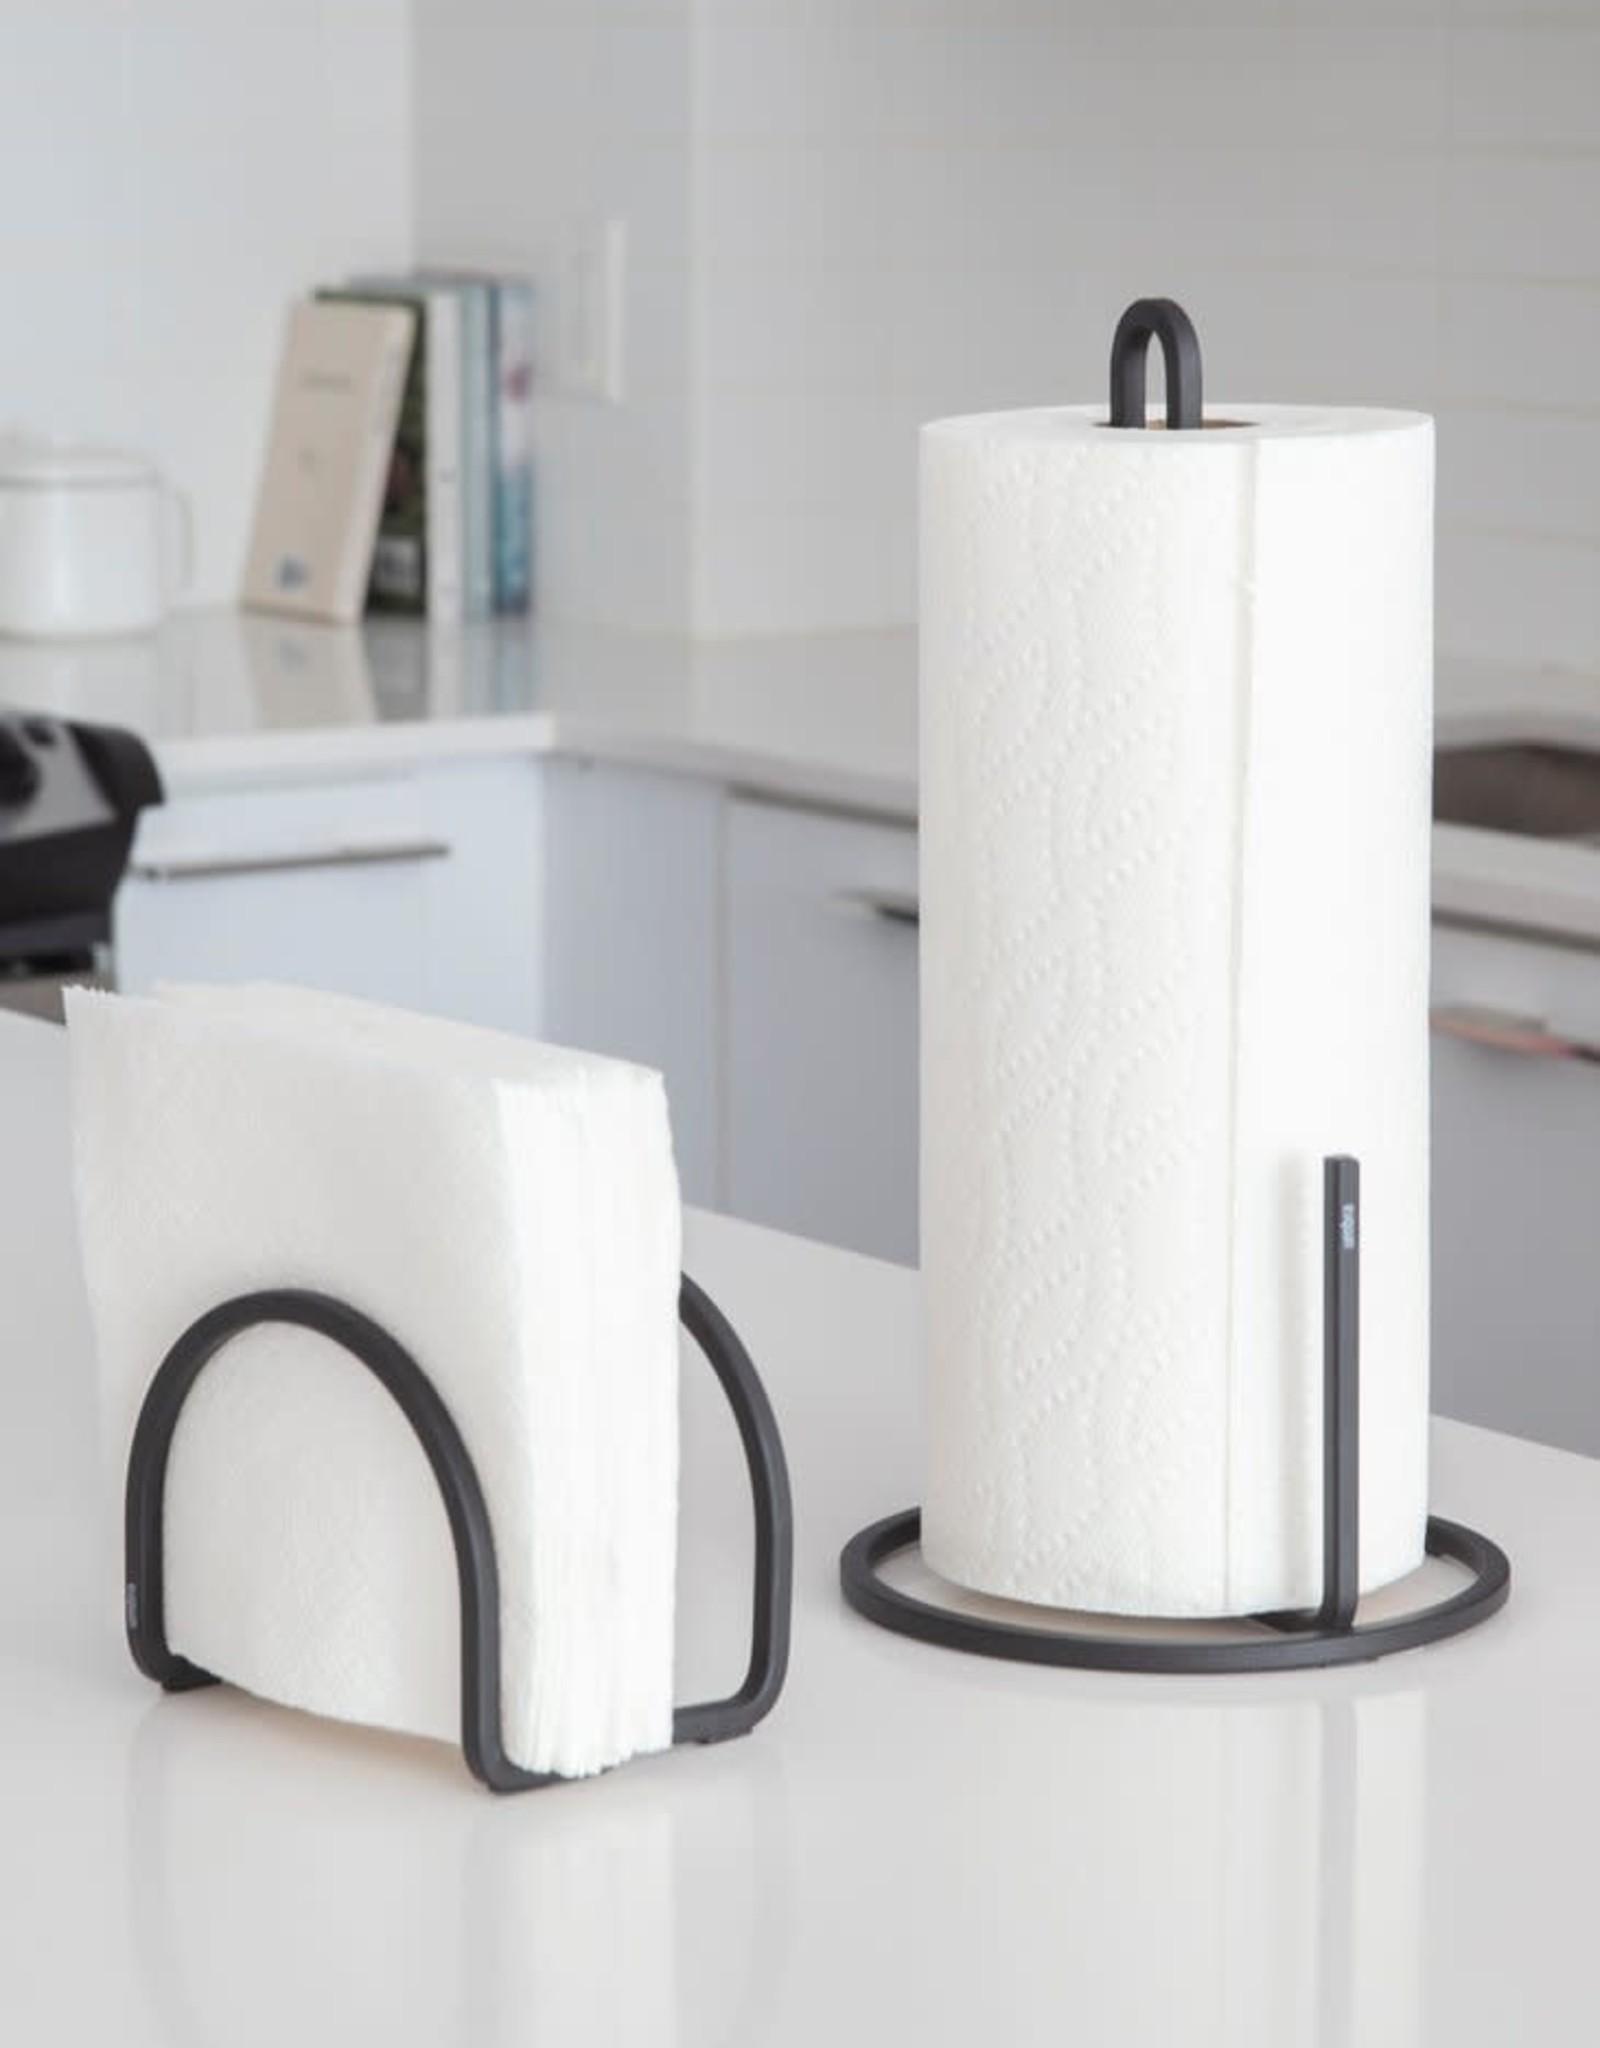 Umbra Umbra - Squire napkin holder black